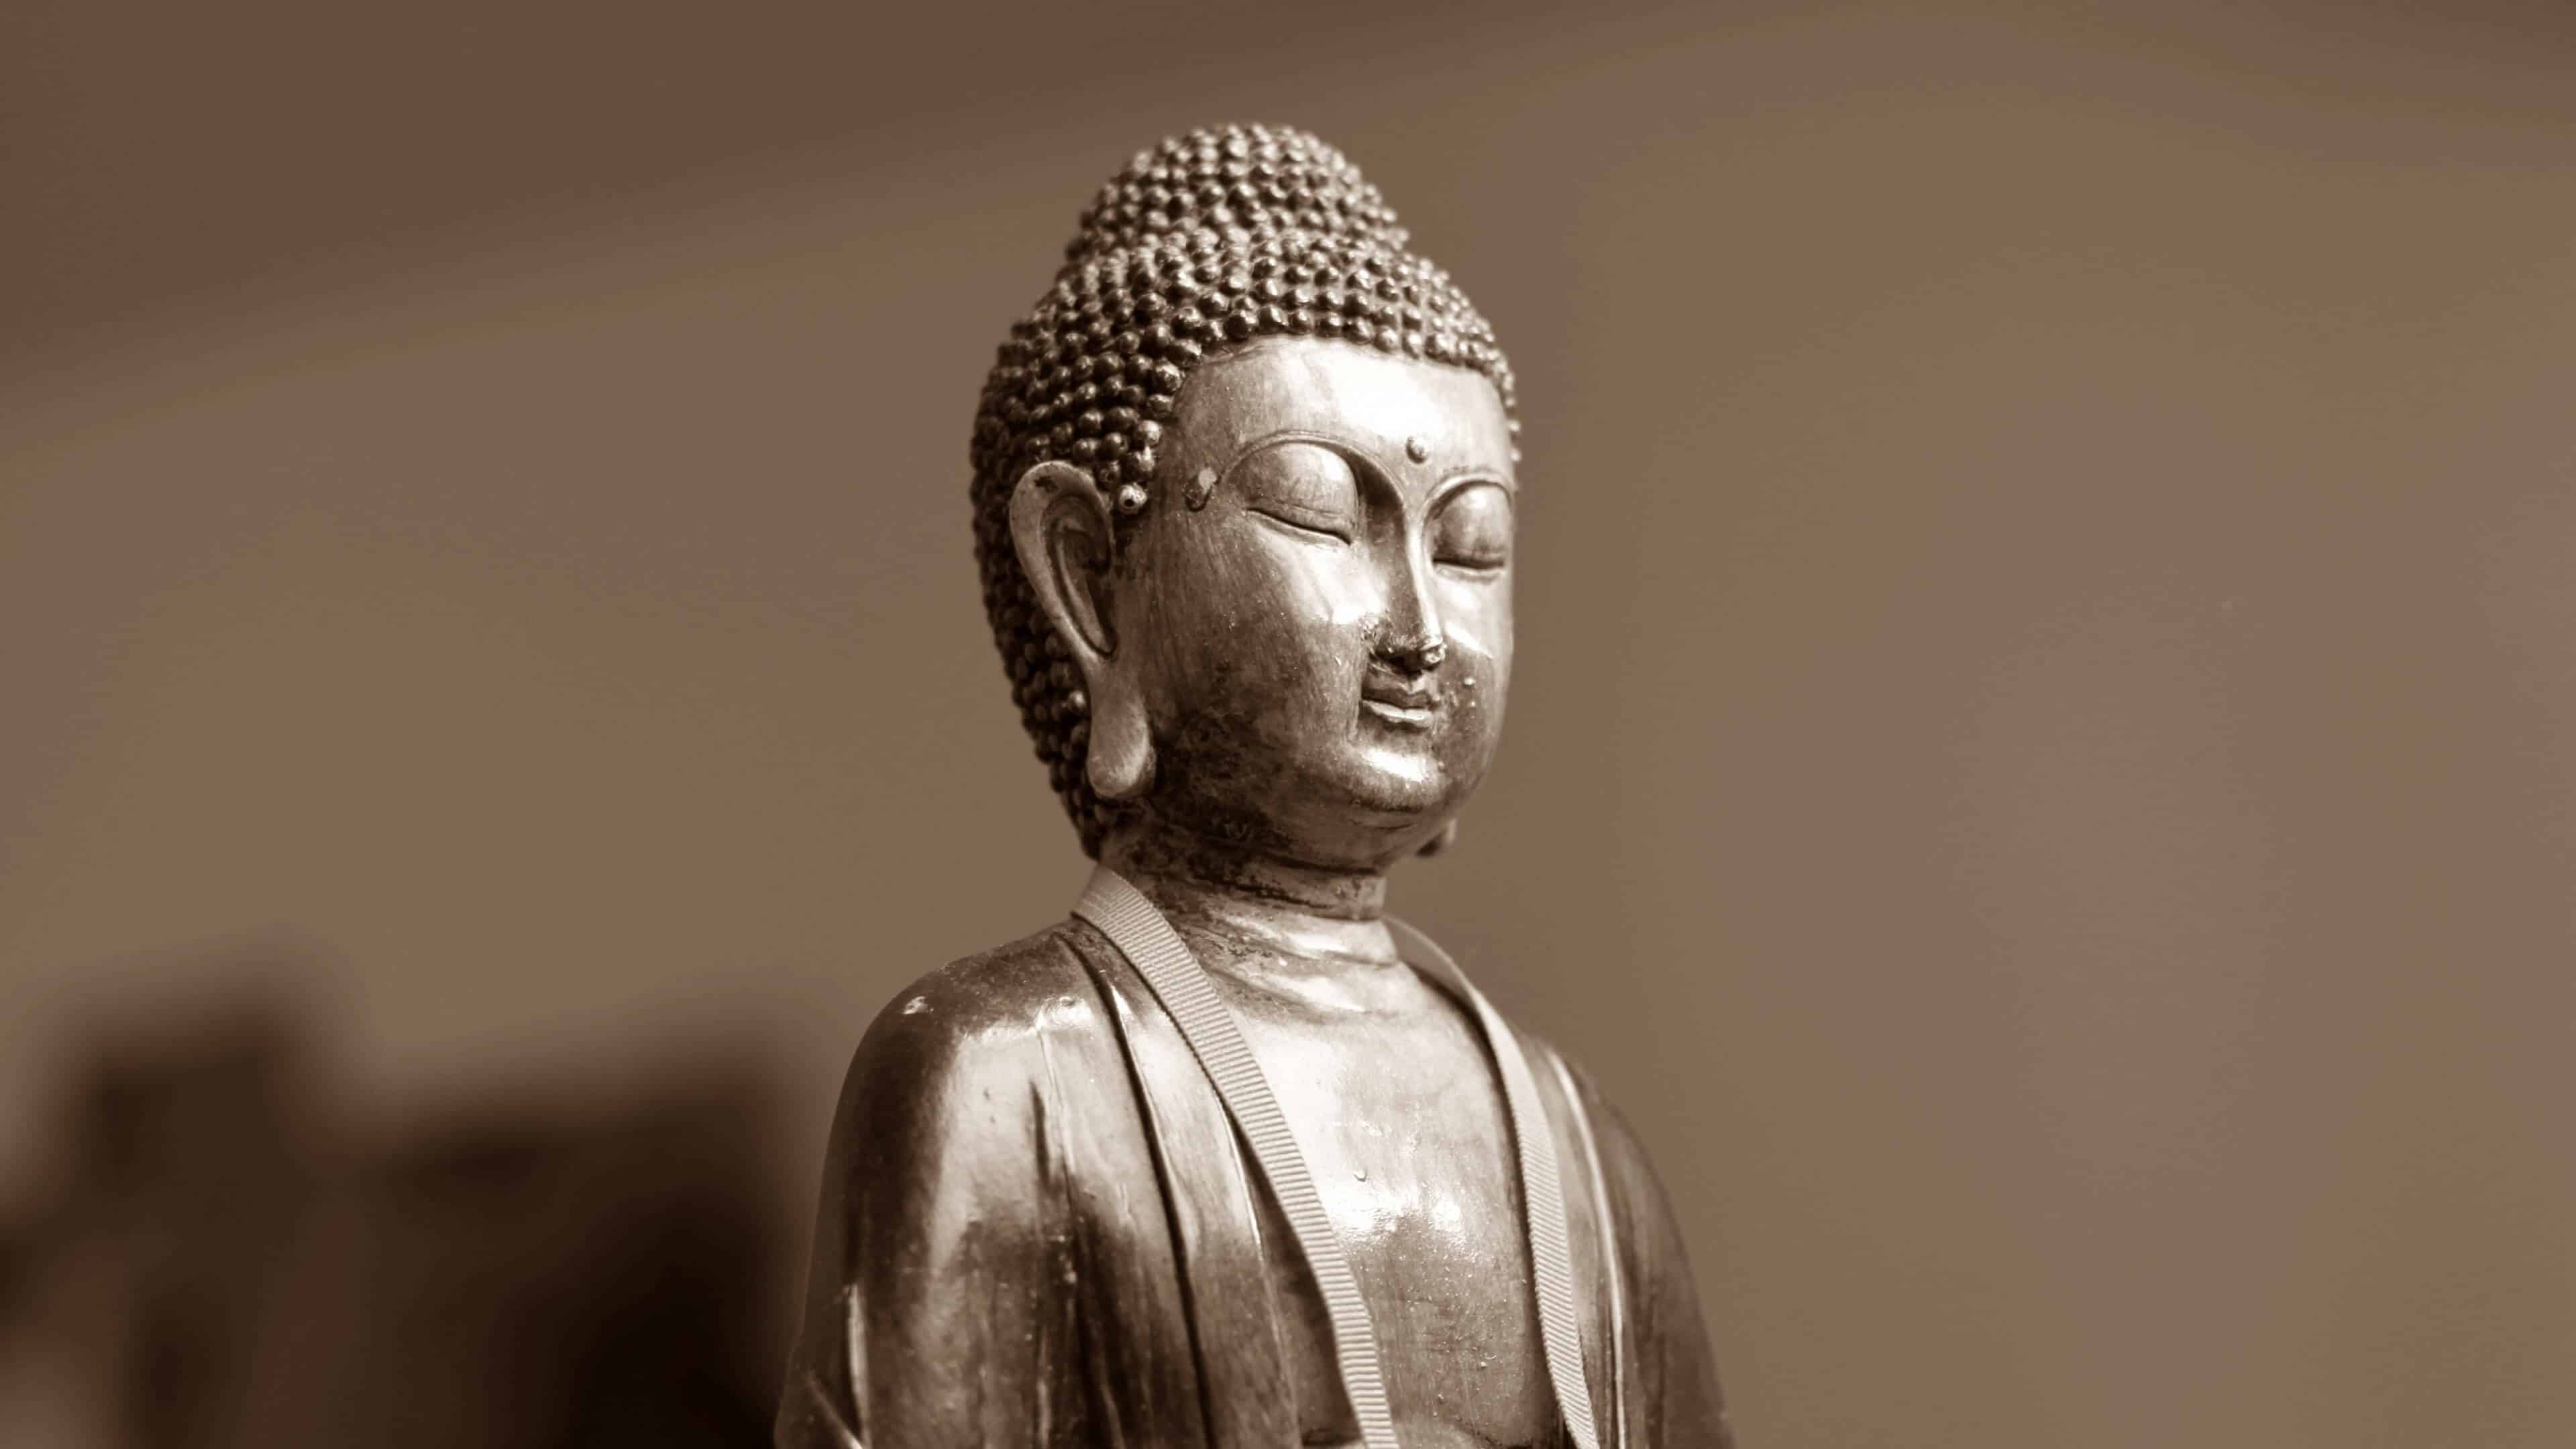 Buddha Wallpaper 8k: Buddha Statue UHD 4K Wallpaper